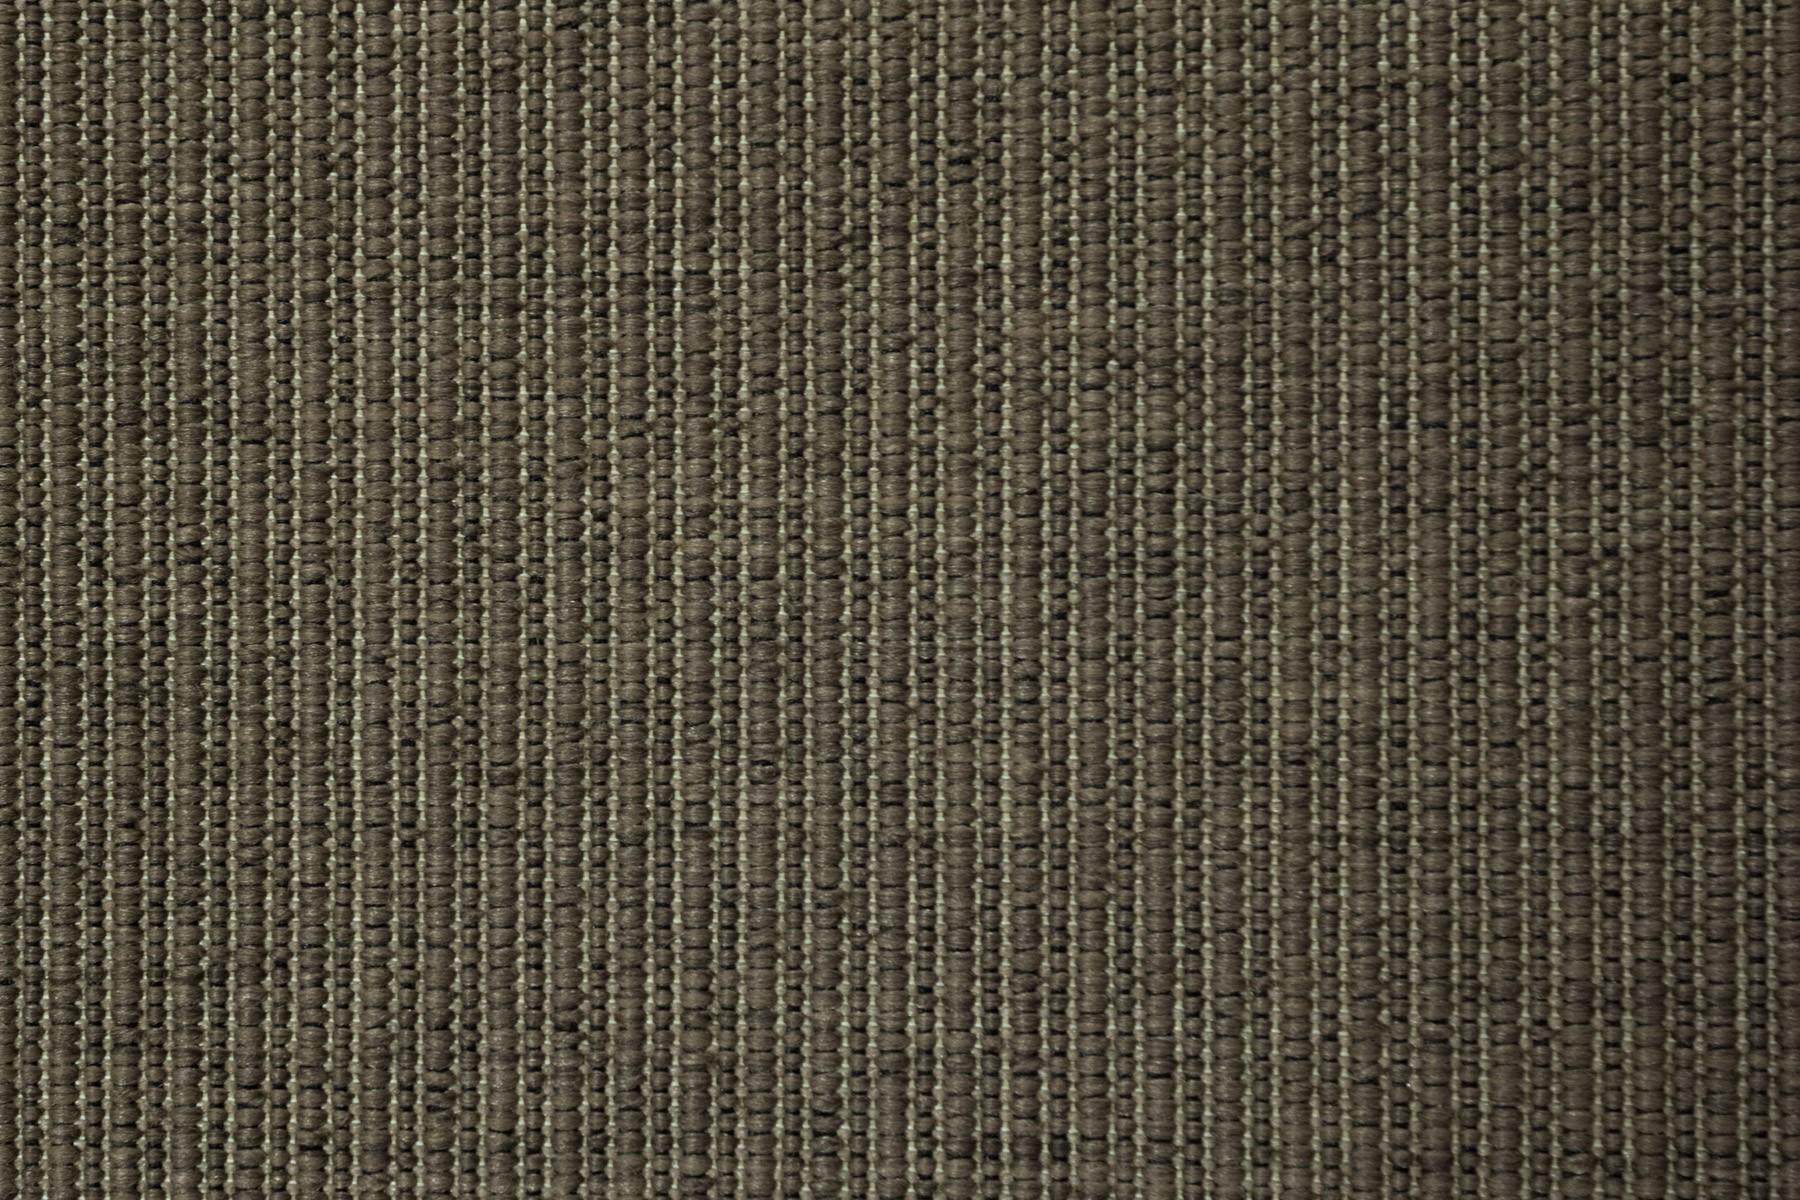 Utestående Terrasse uteteppe Pure deco brun - Gulvdeal TF-83